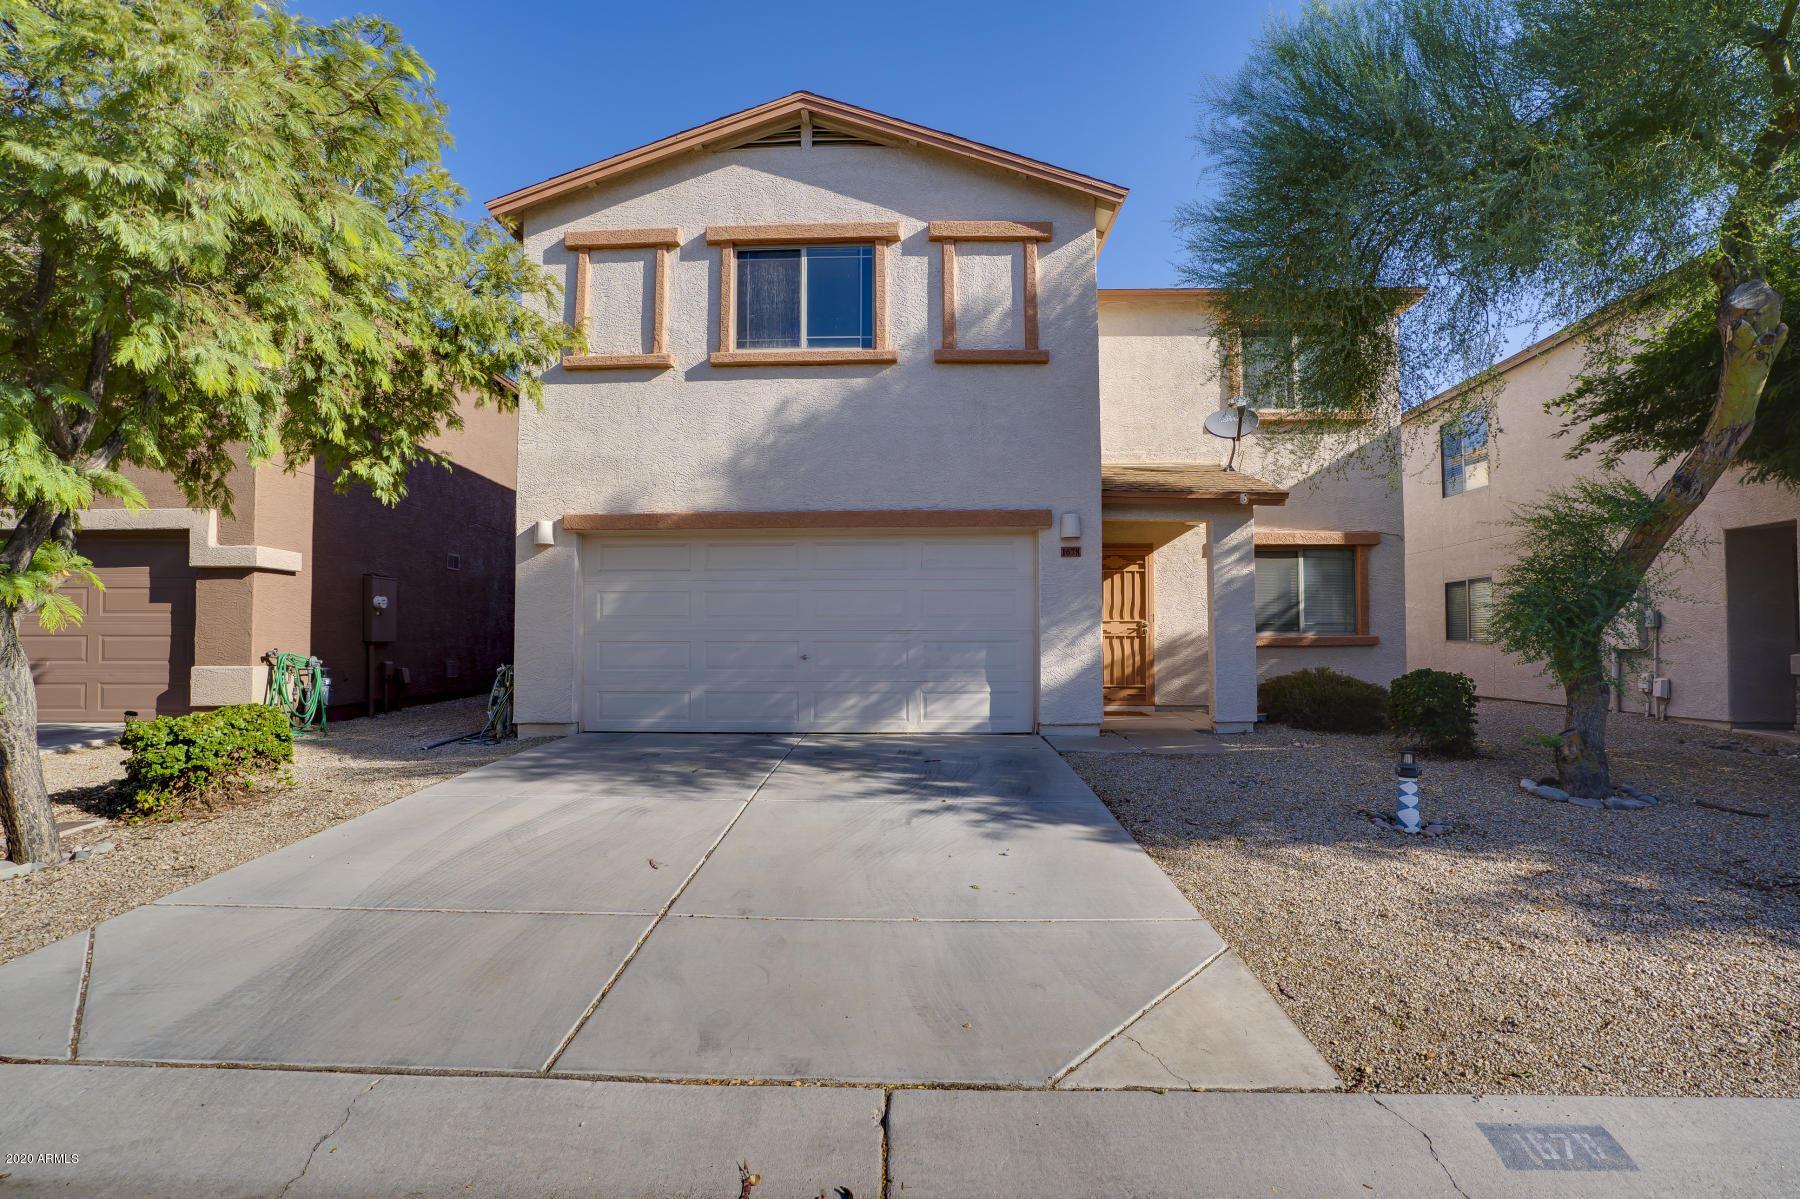 1678 E Silktassel Trail, San Tan Valley, AZ 85143 - MLS#: 6130342